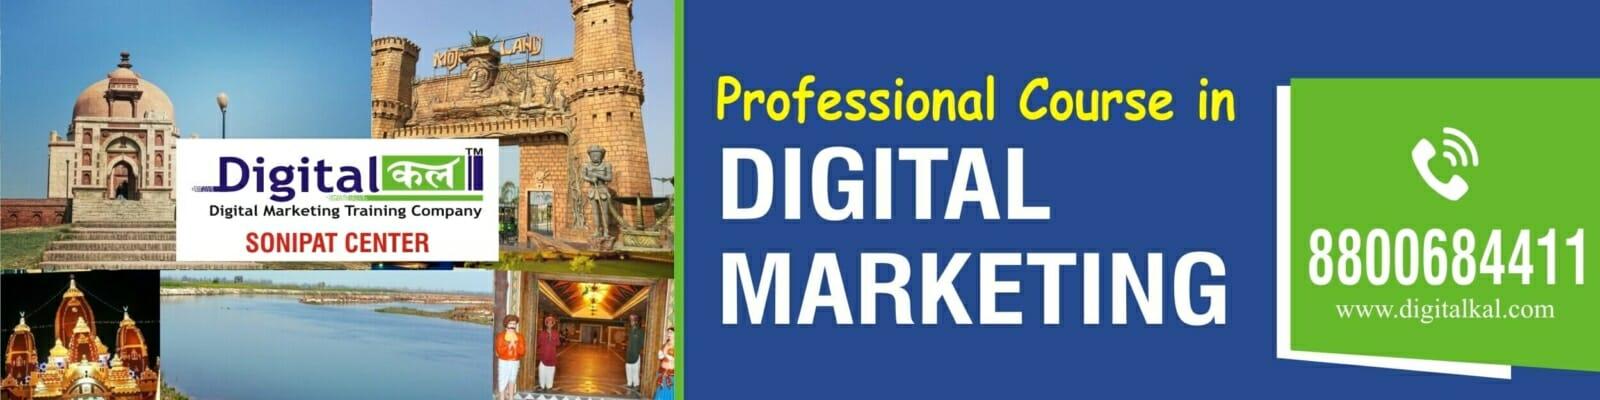 Digital Marketing Course Sonipat